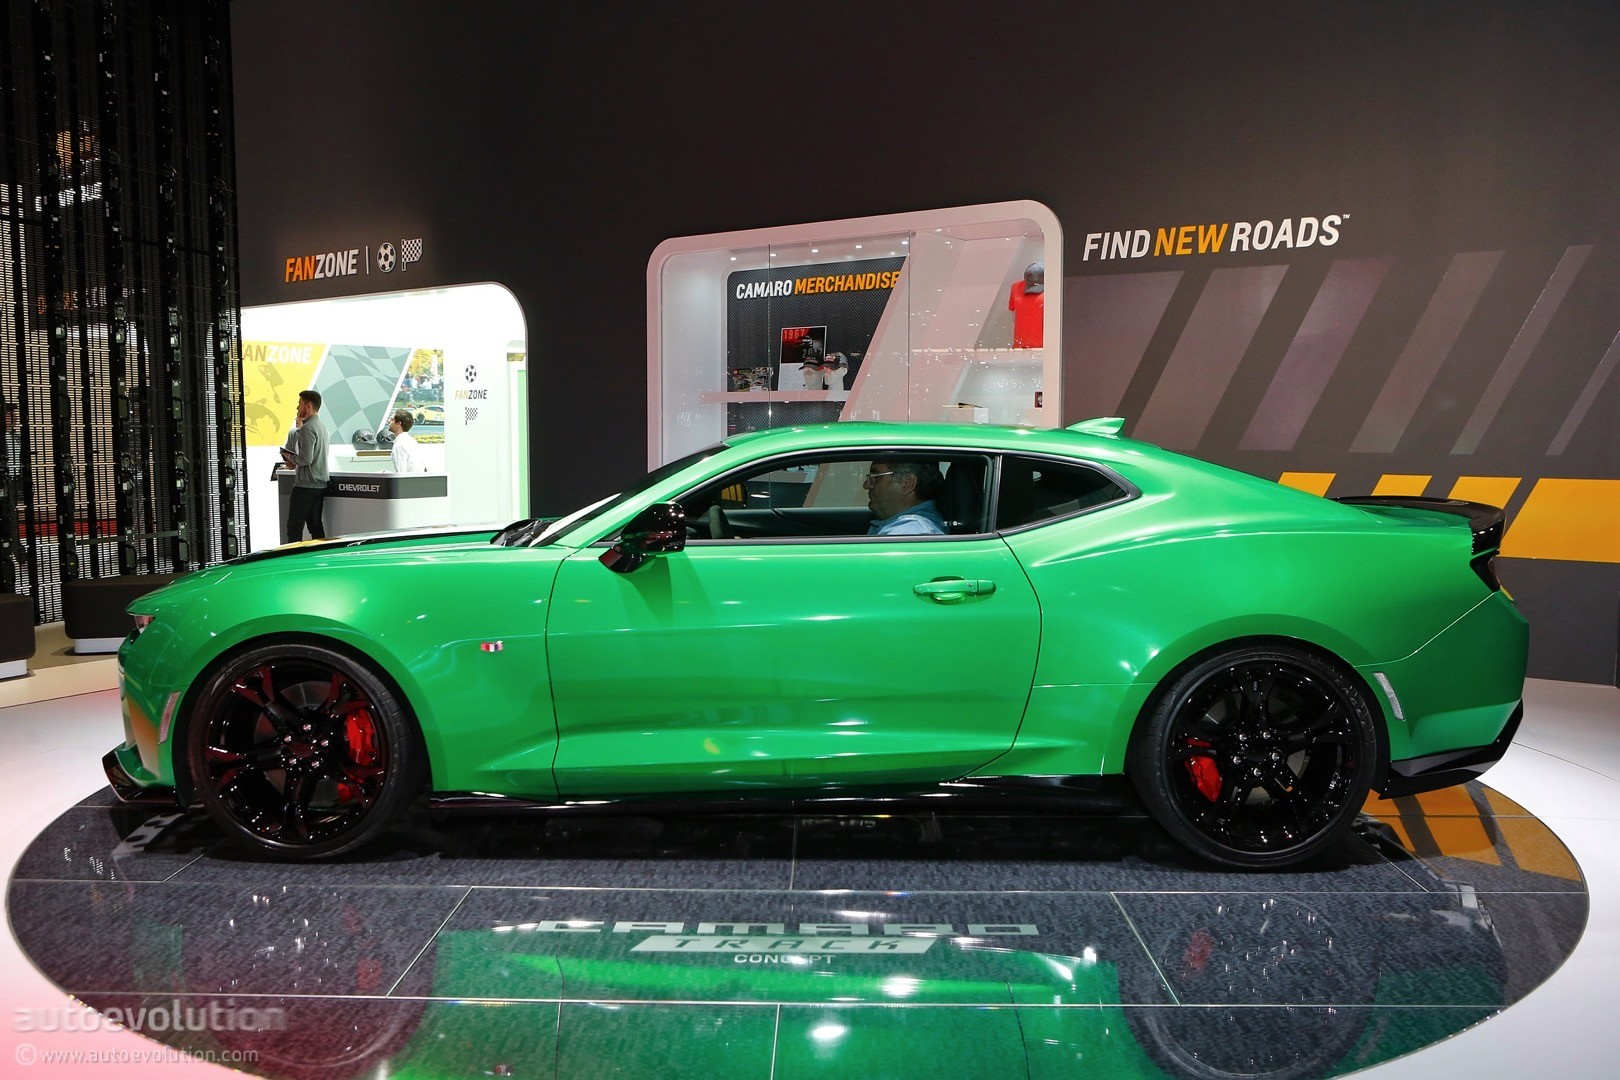 Chevrolet S Geneva Concept Is A Camaro 1le In Disguise